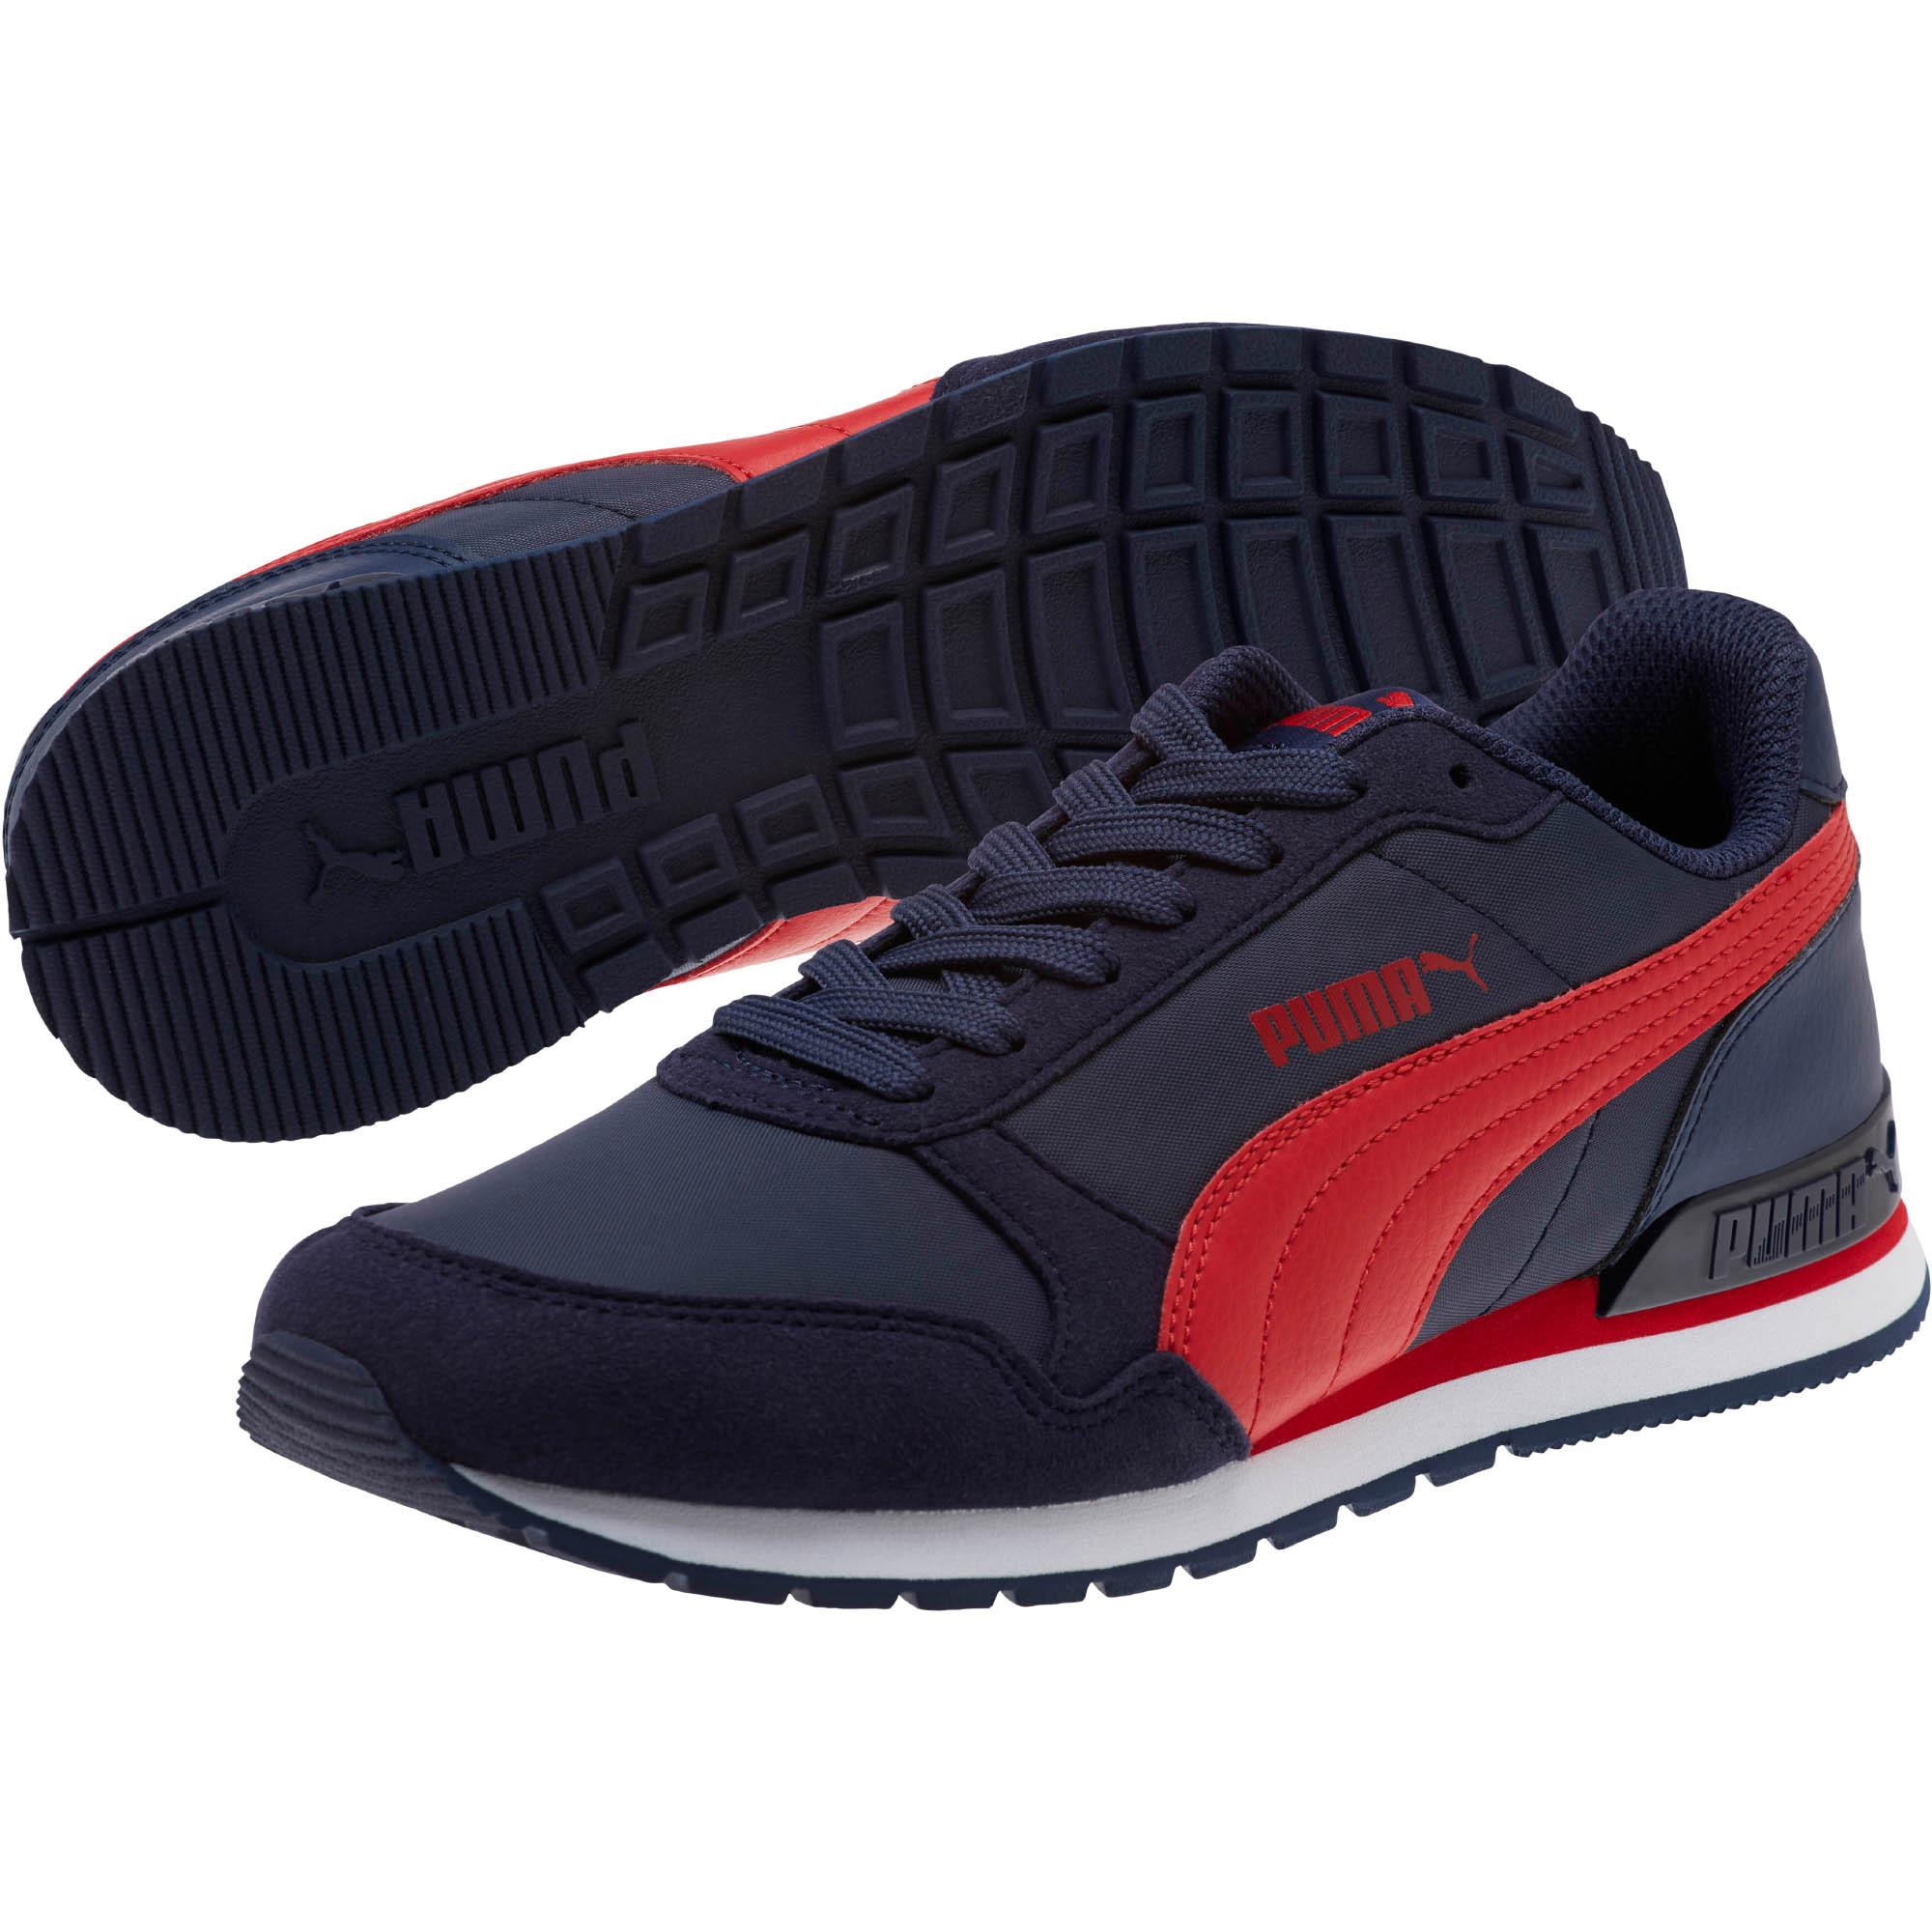 9efa67940186 Official Puma Store  PUMA ST Runner v2 NL JR Sneakers Boys Shoe Kids ...